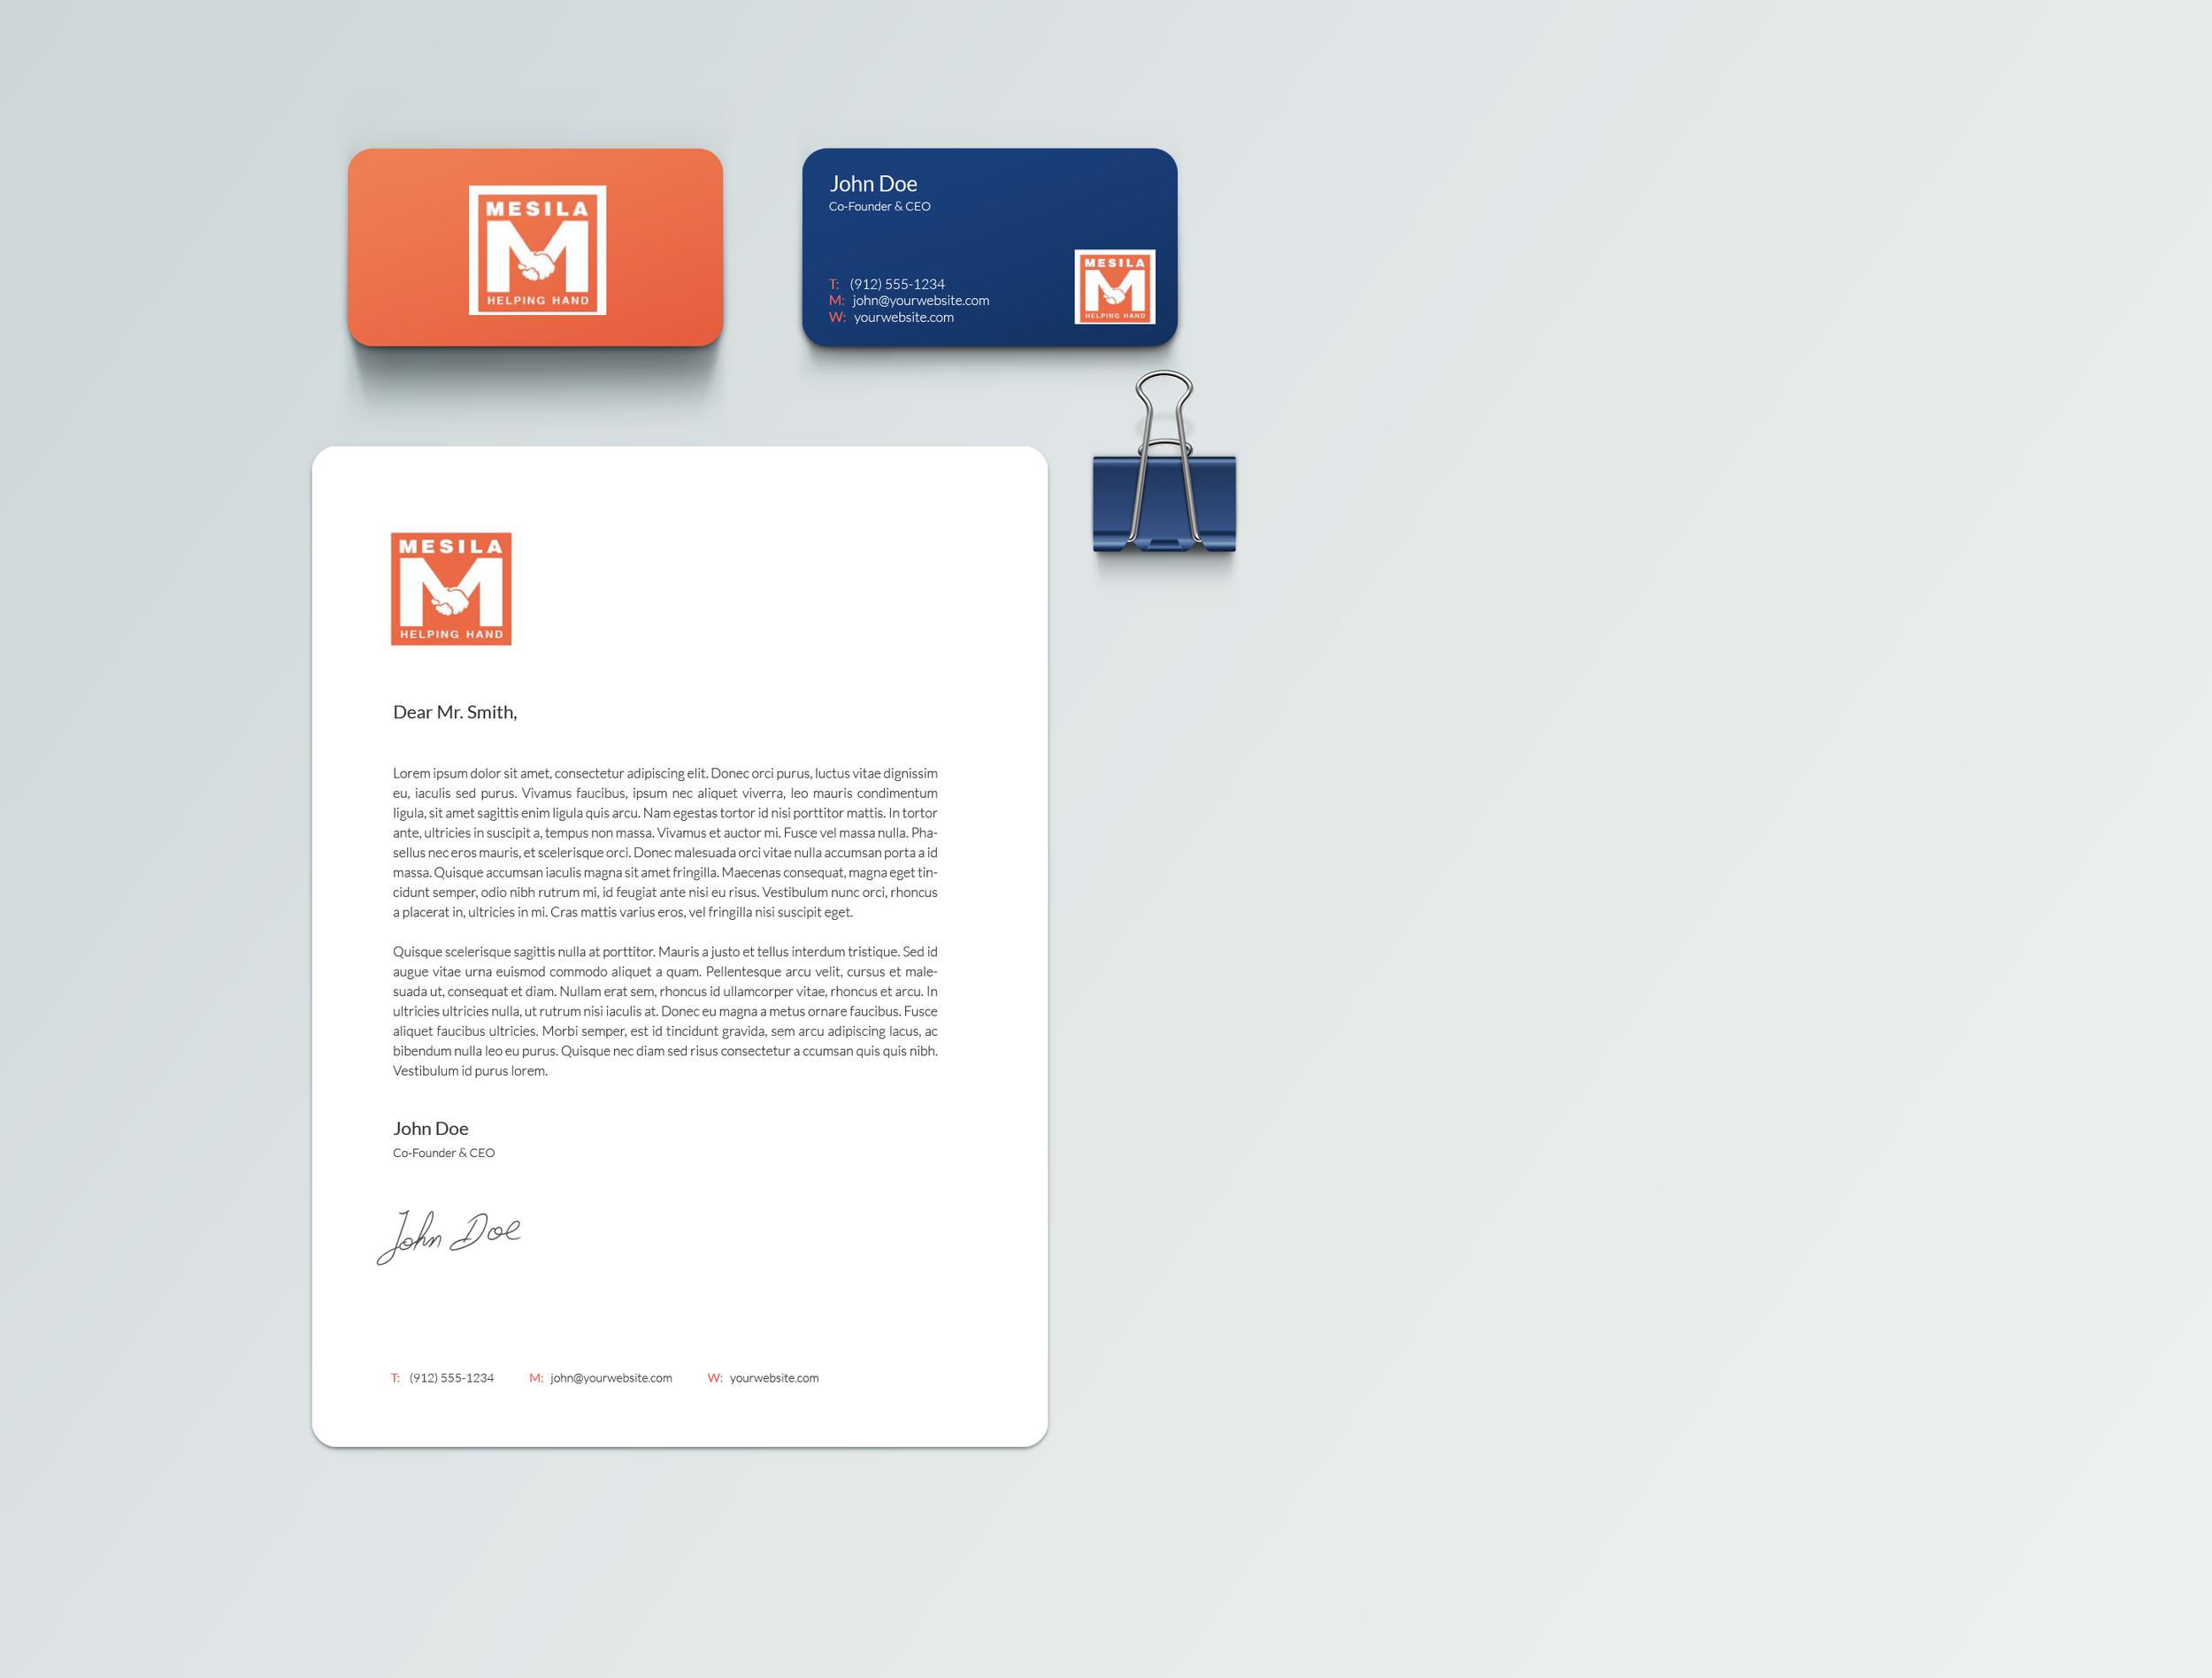 Branding Identity Mockup mesila.png